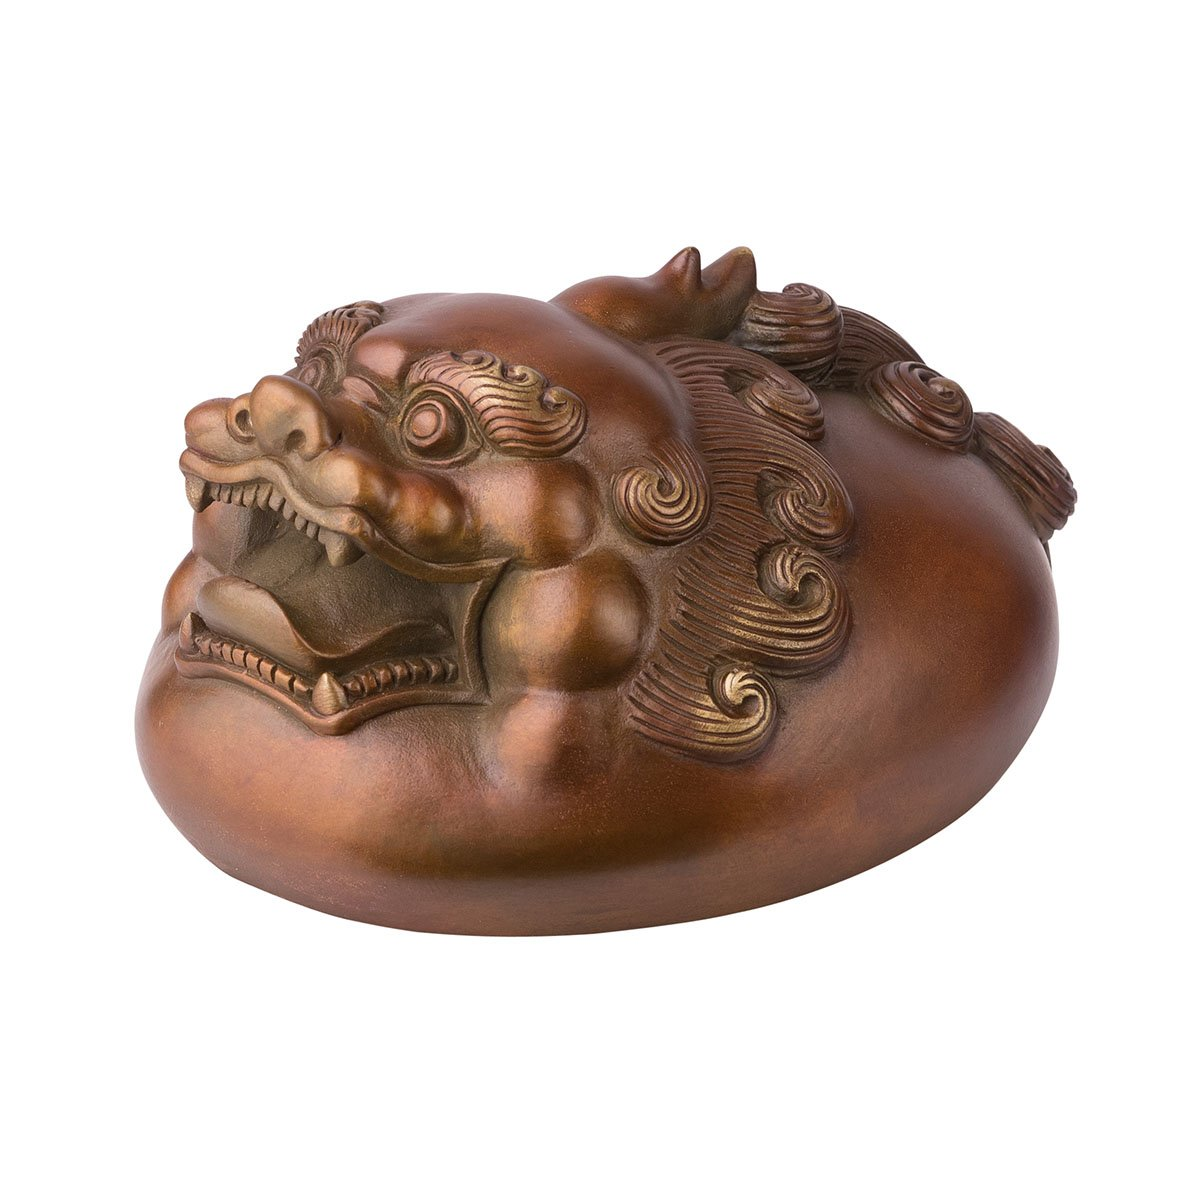 brassmaster fortuna de Pi Xiu Estatua Artware adorno de latón todos ...